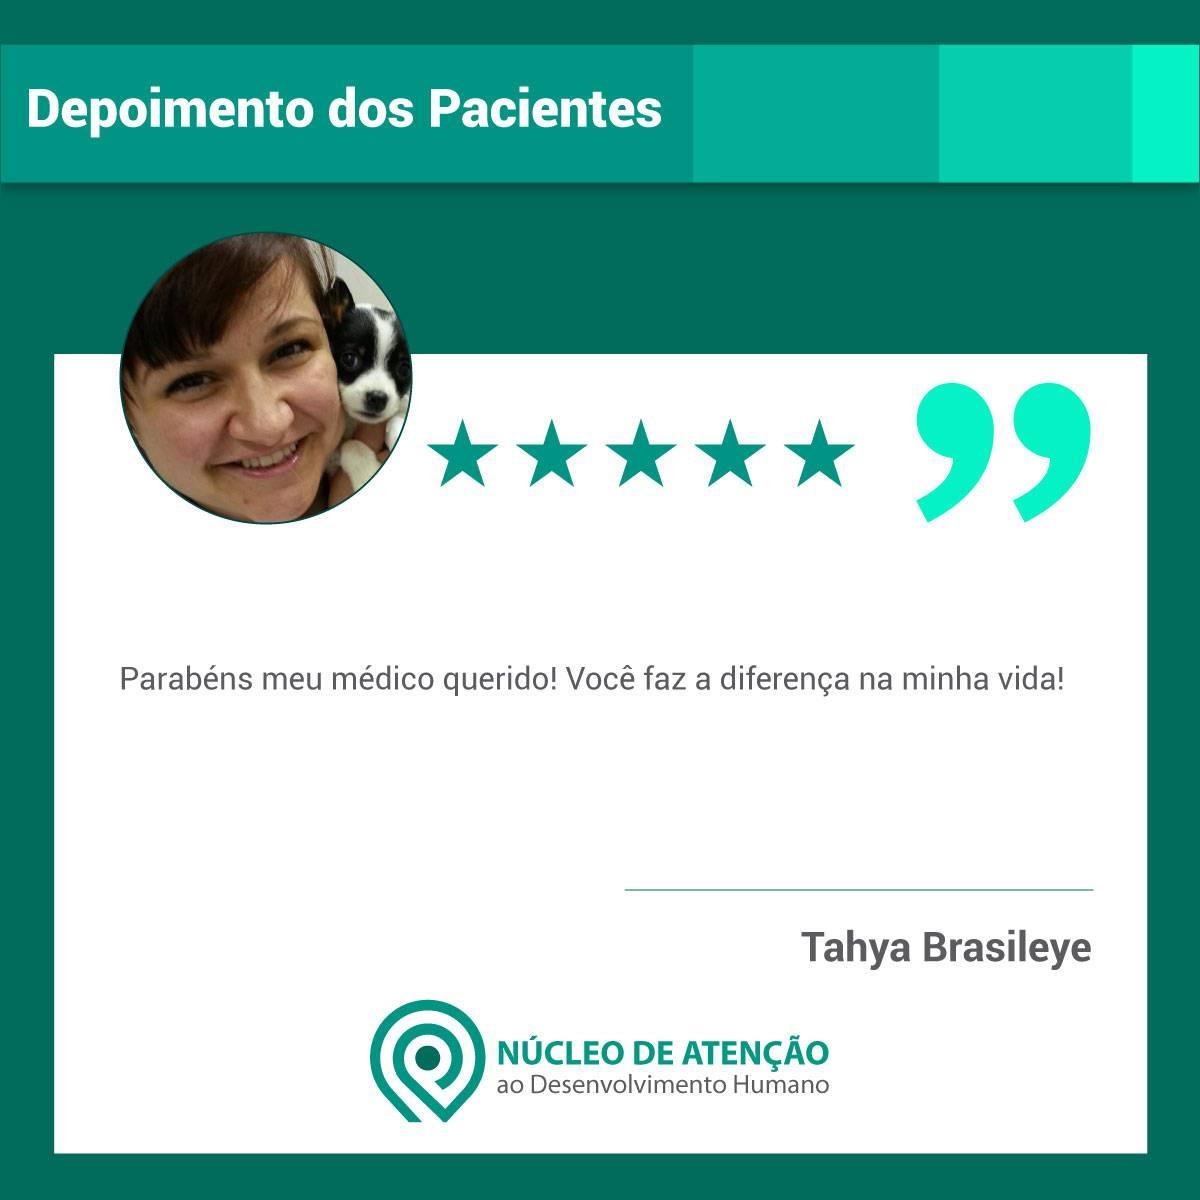 depoimento-dos-pacientes-tahya-brasileye